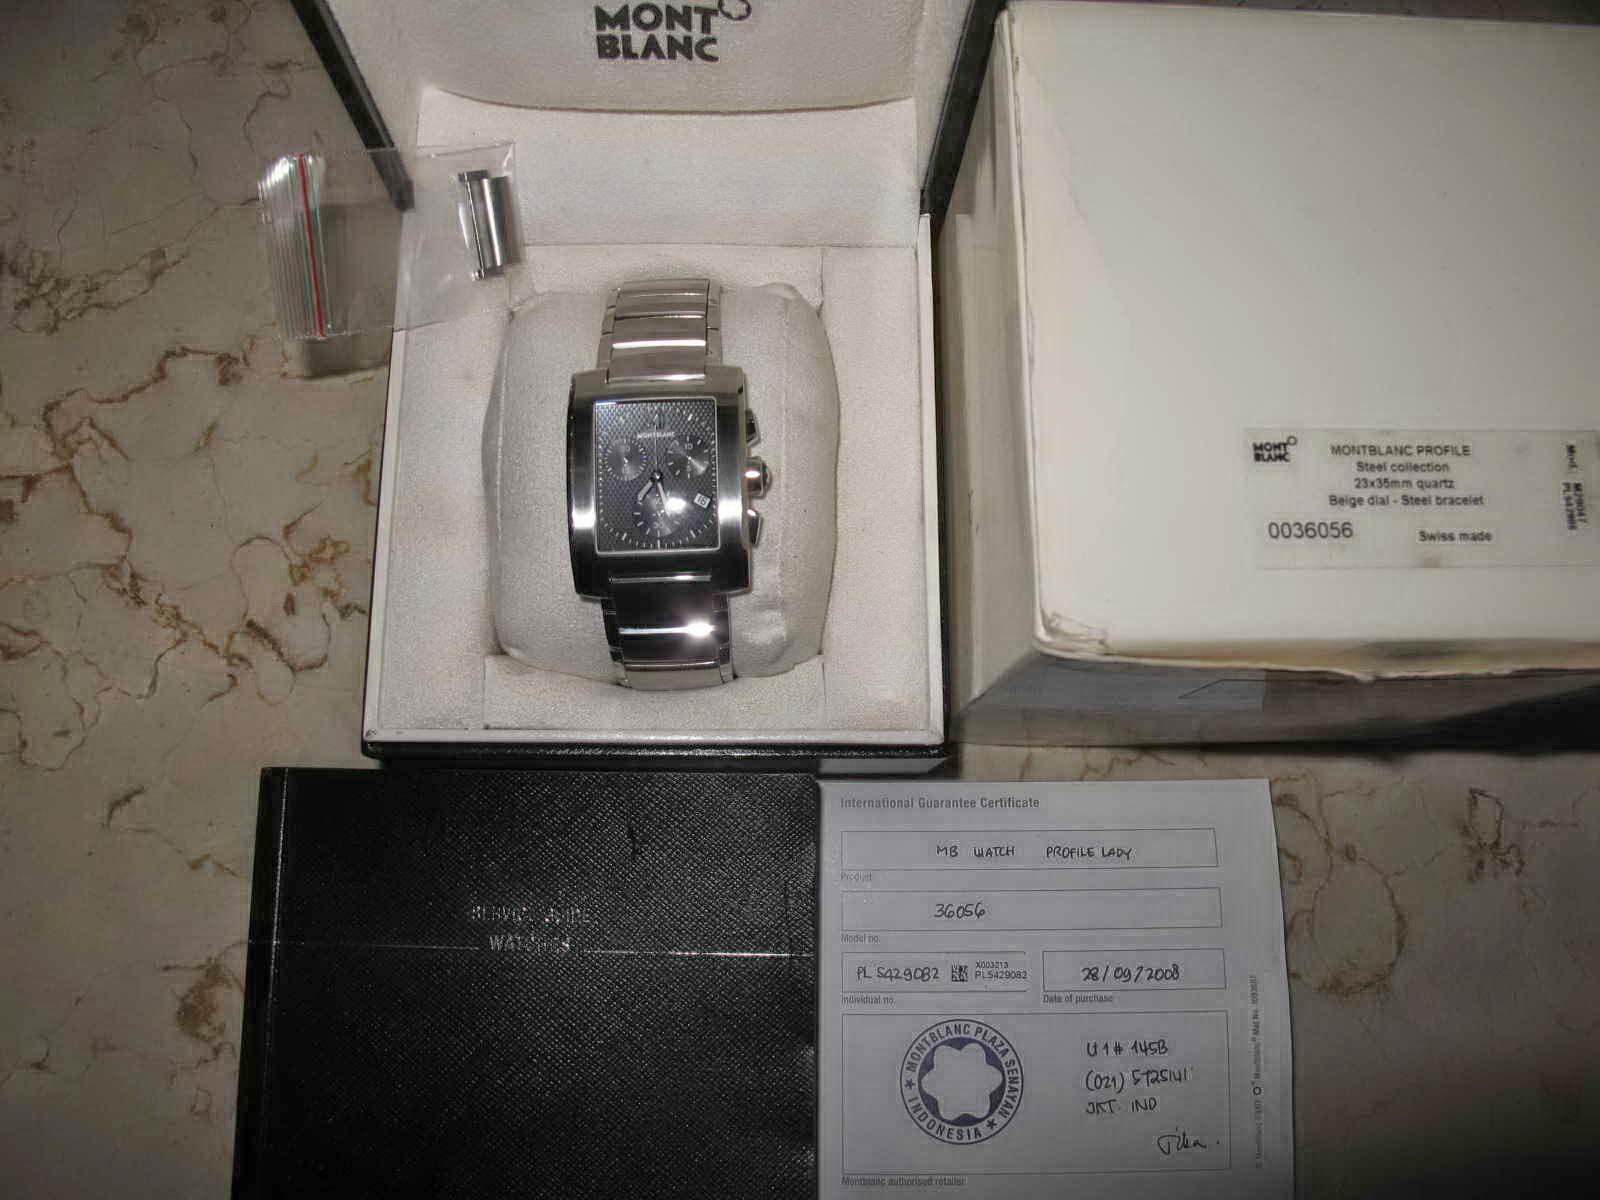 SUPERB lengkap dengan box manual dan warrant card Cocok untuk Anda yang sedang mencari jam tangan dengan bentuk case kotak Swiss made